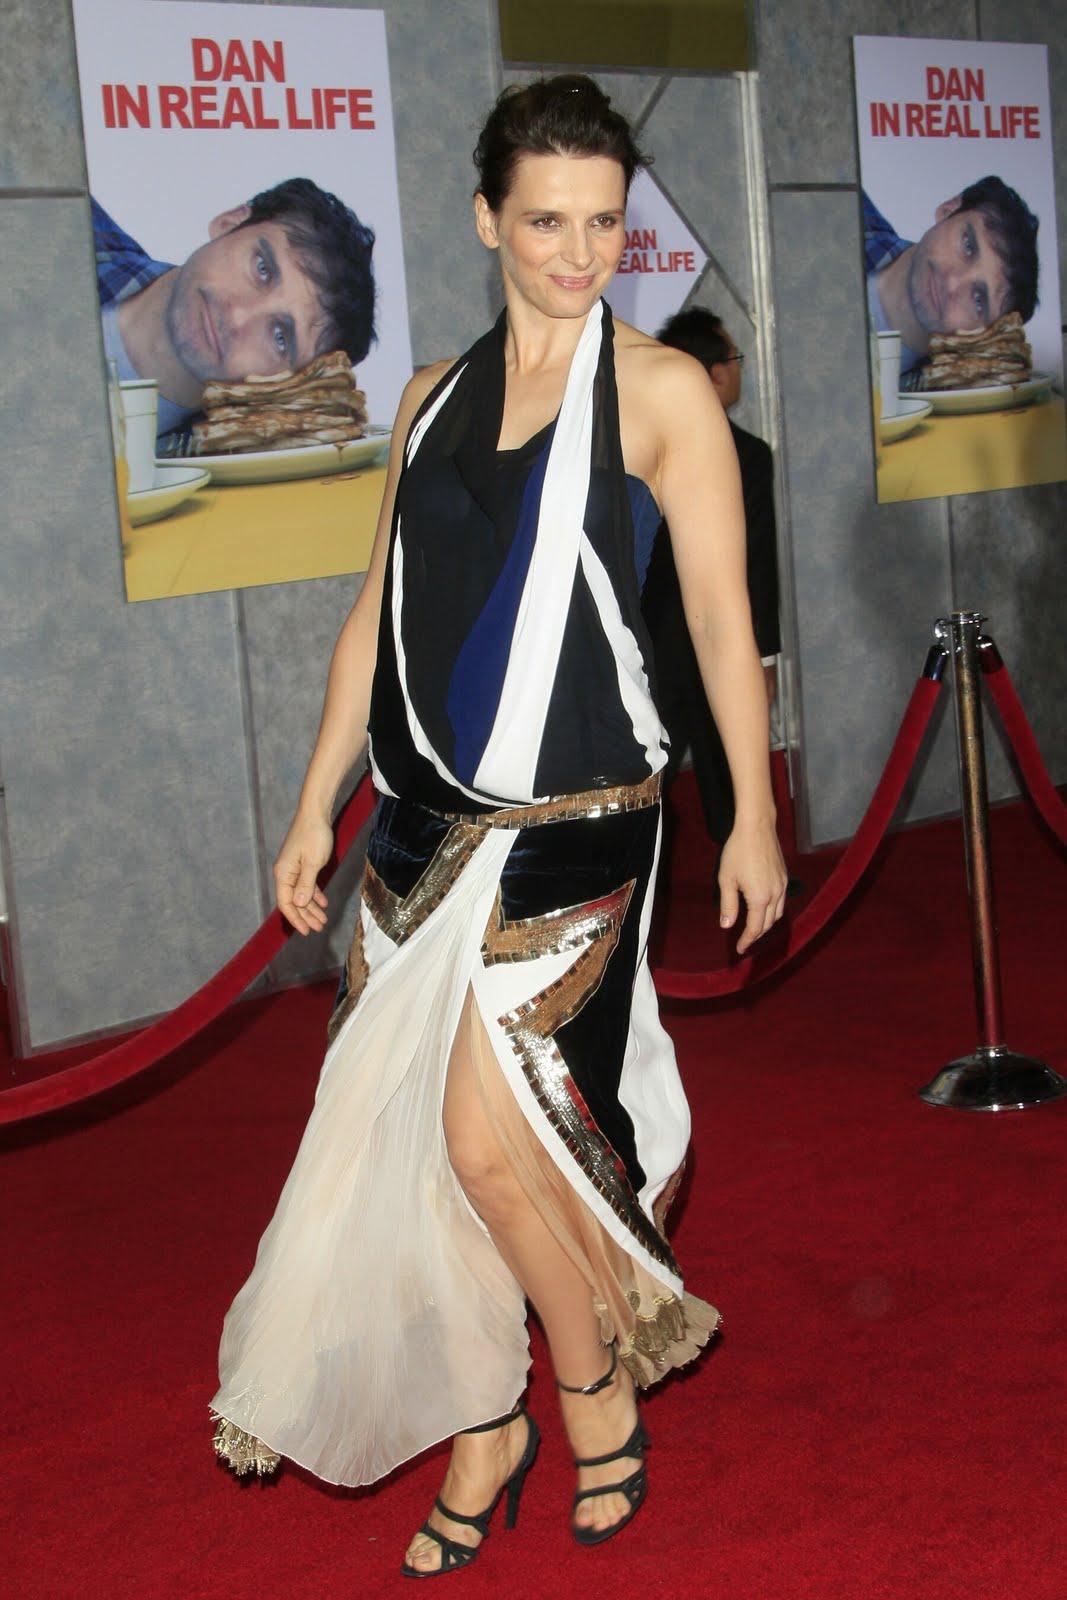 http://3.bp.blogspot.com/_UaLWp72nij4/S-NLdmw_lzI/AAAAAAAAKCA/yvlYQ6BQvx8/s1600/juliette-binoche-feet.jpg